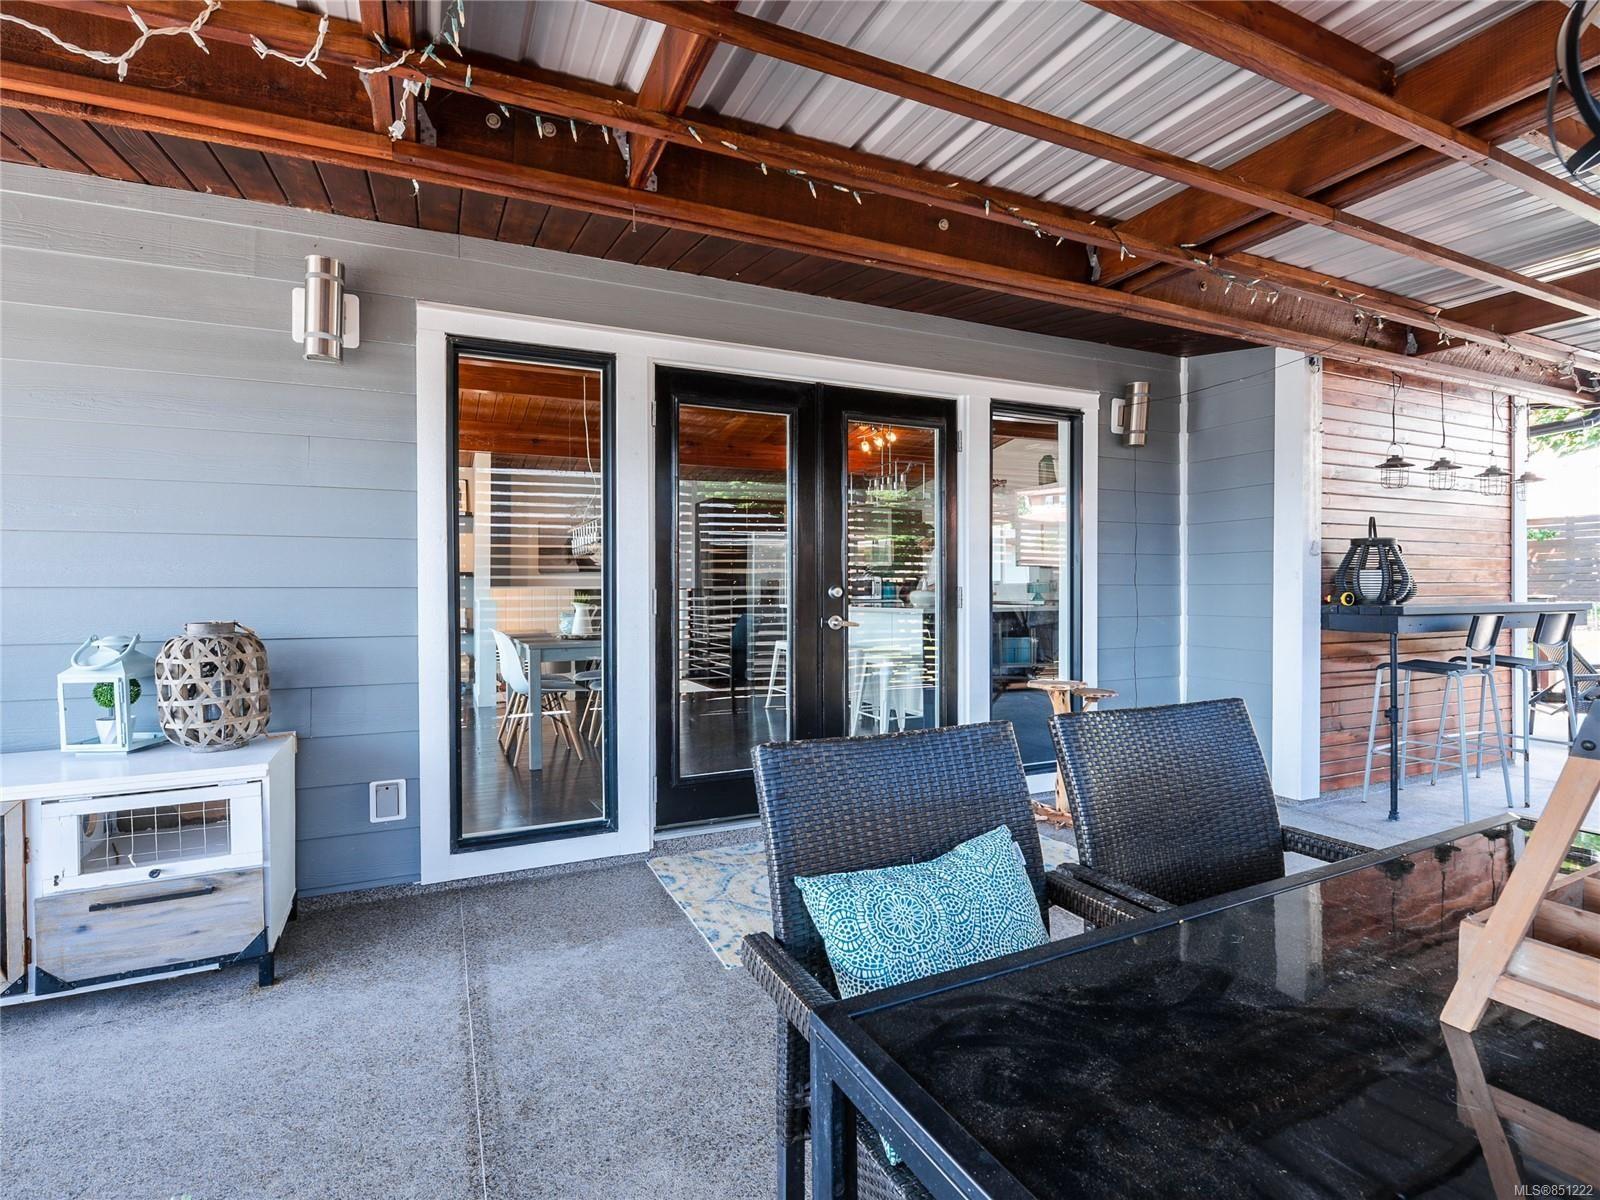 Photo 31: Photos: 2525 11th Ave in : PA Port Alberni House for sale (Port Alberni)  : MLS®# 851222